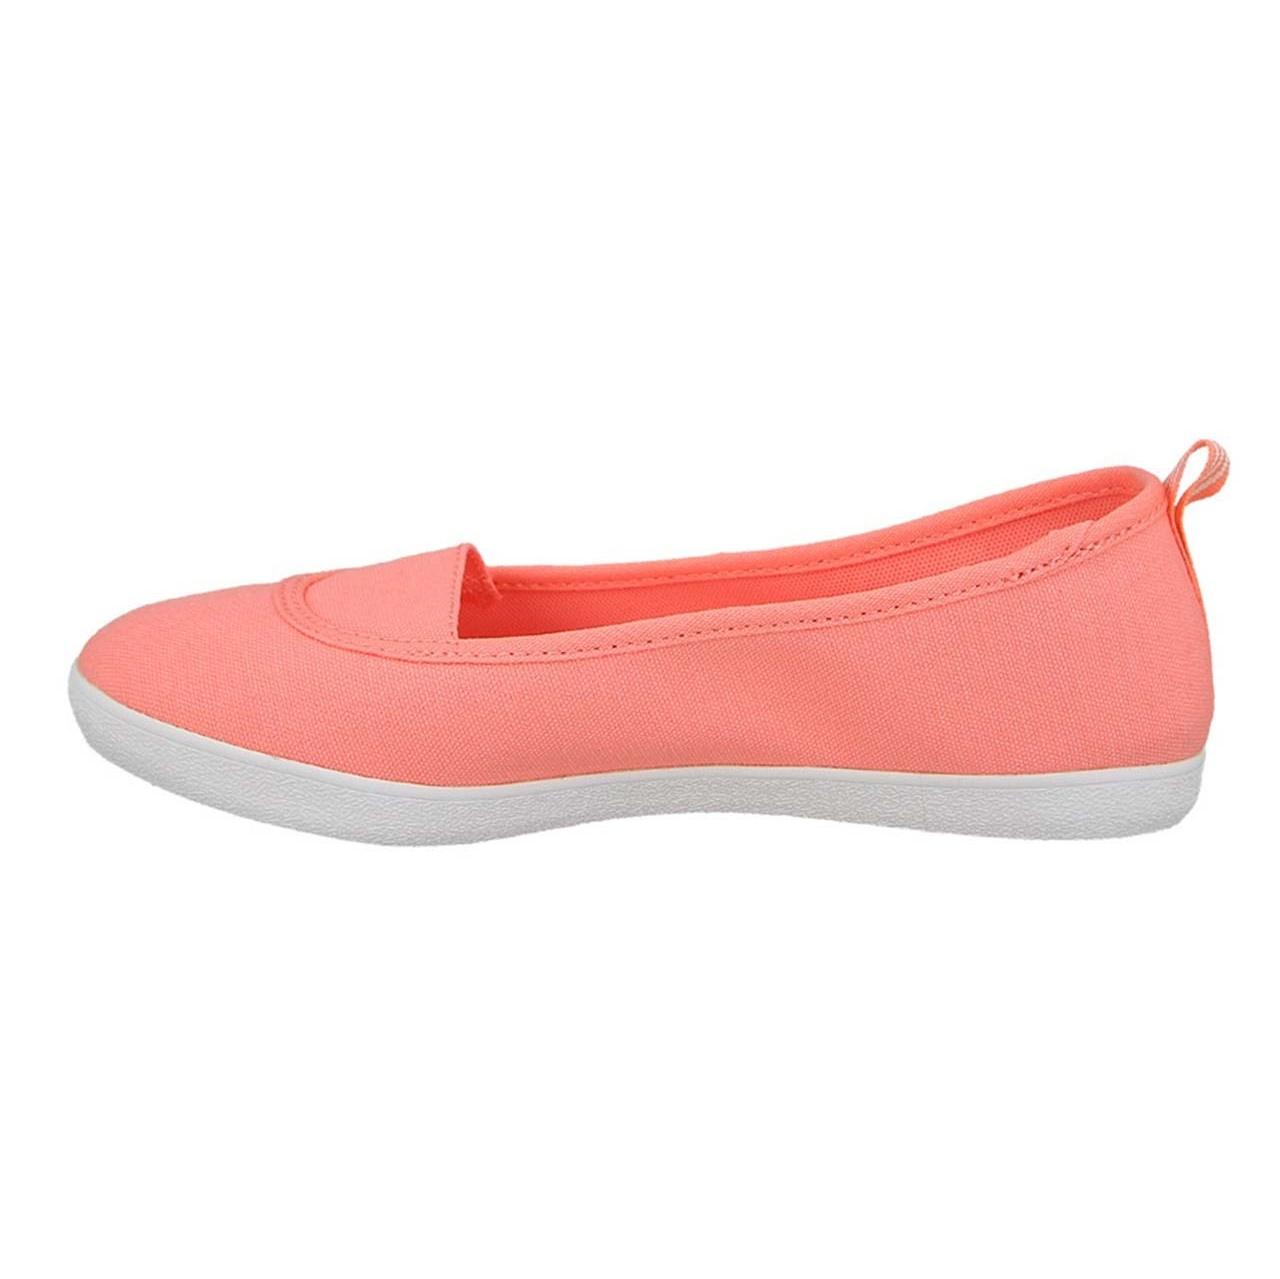 کفش راحتی زنانه آدیداس مدل QT VULC